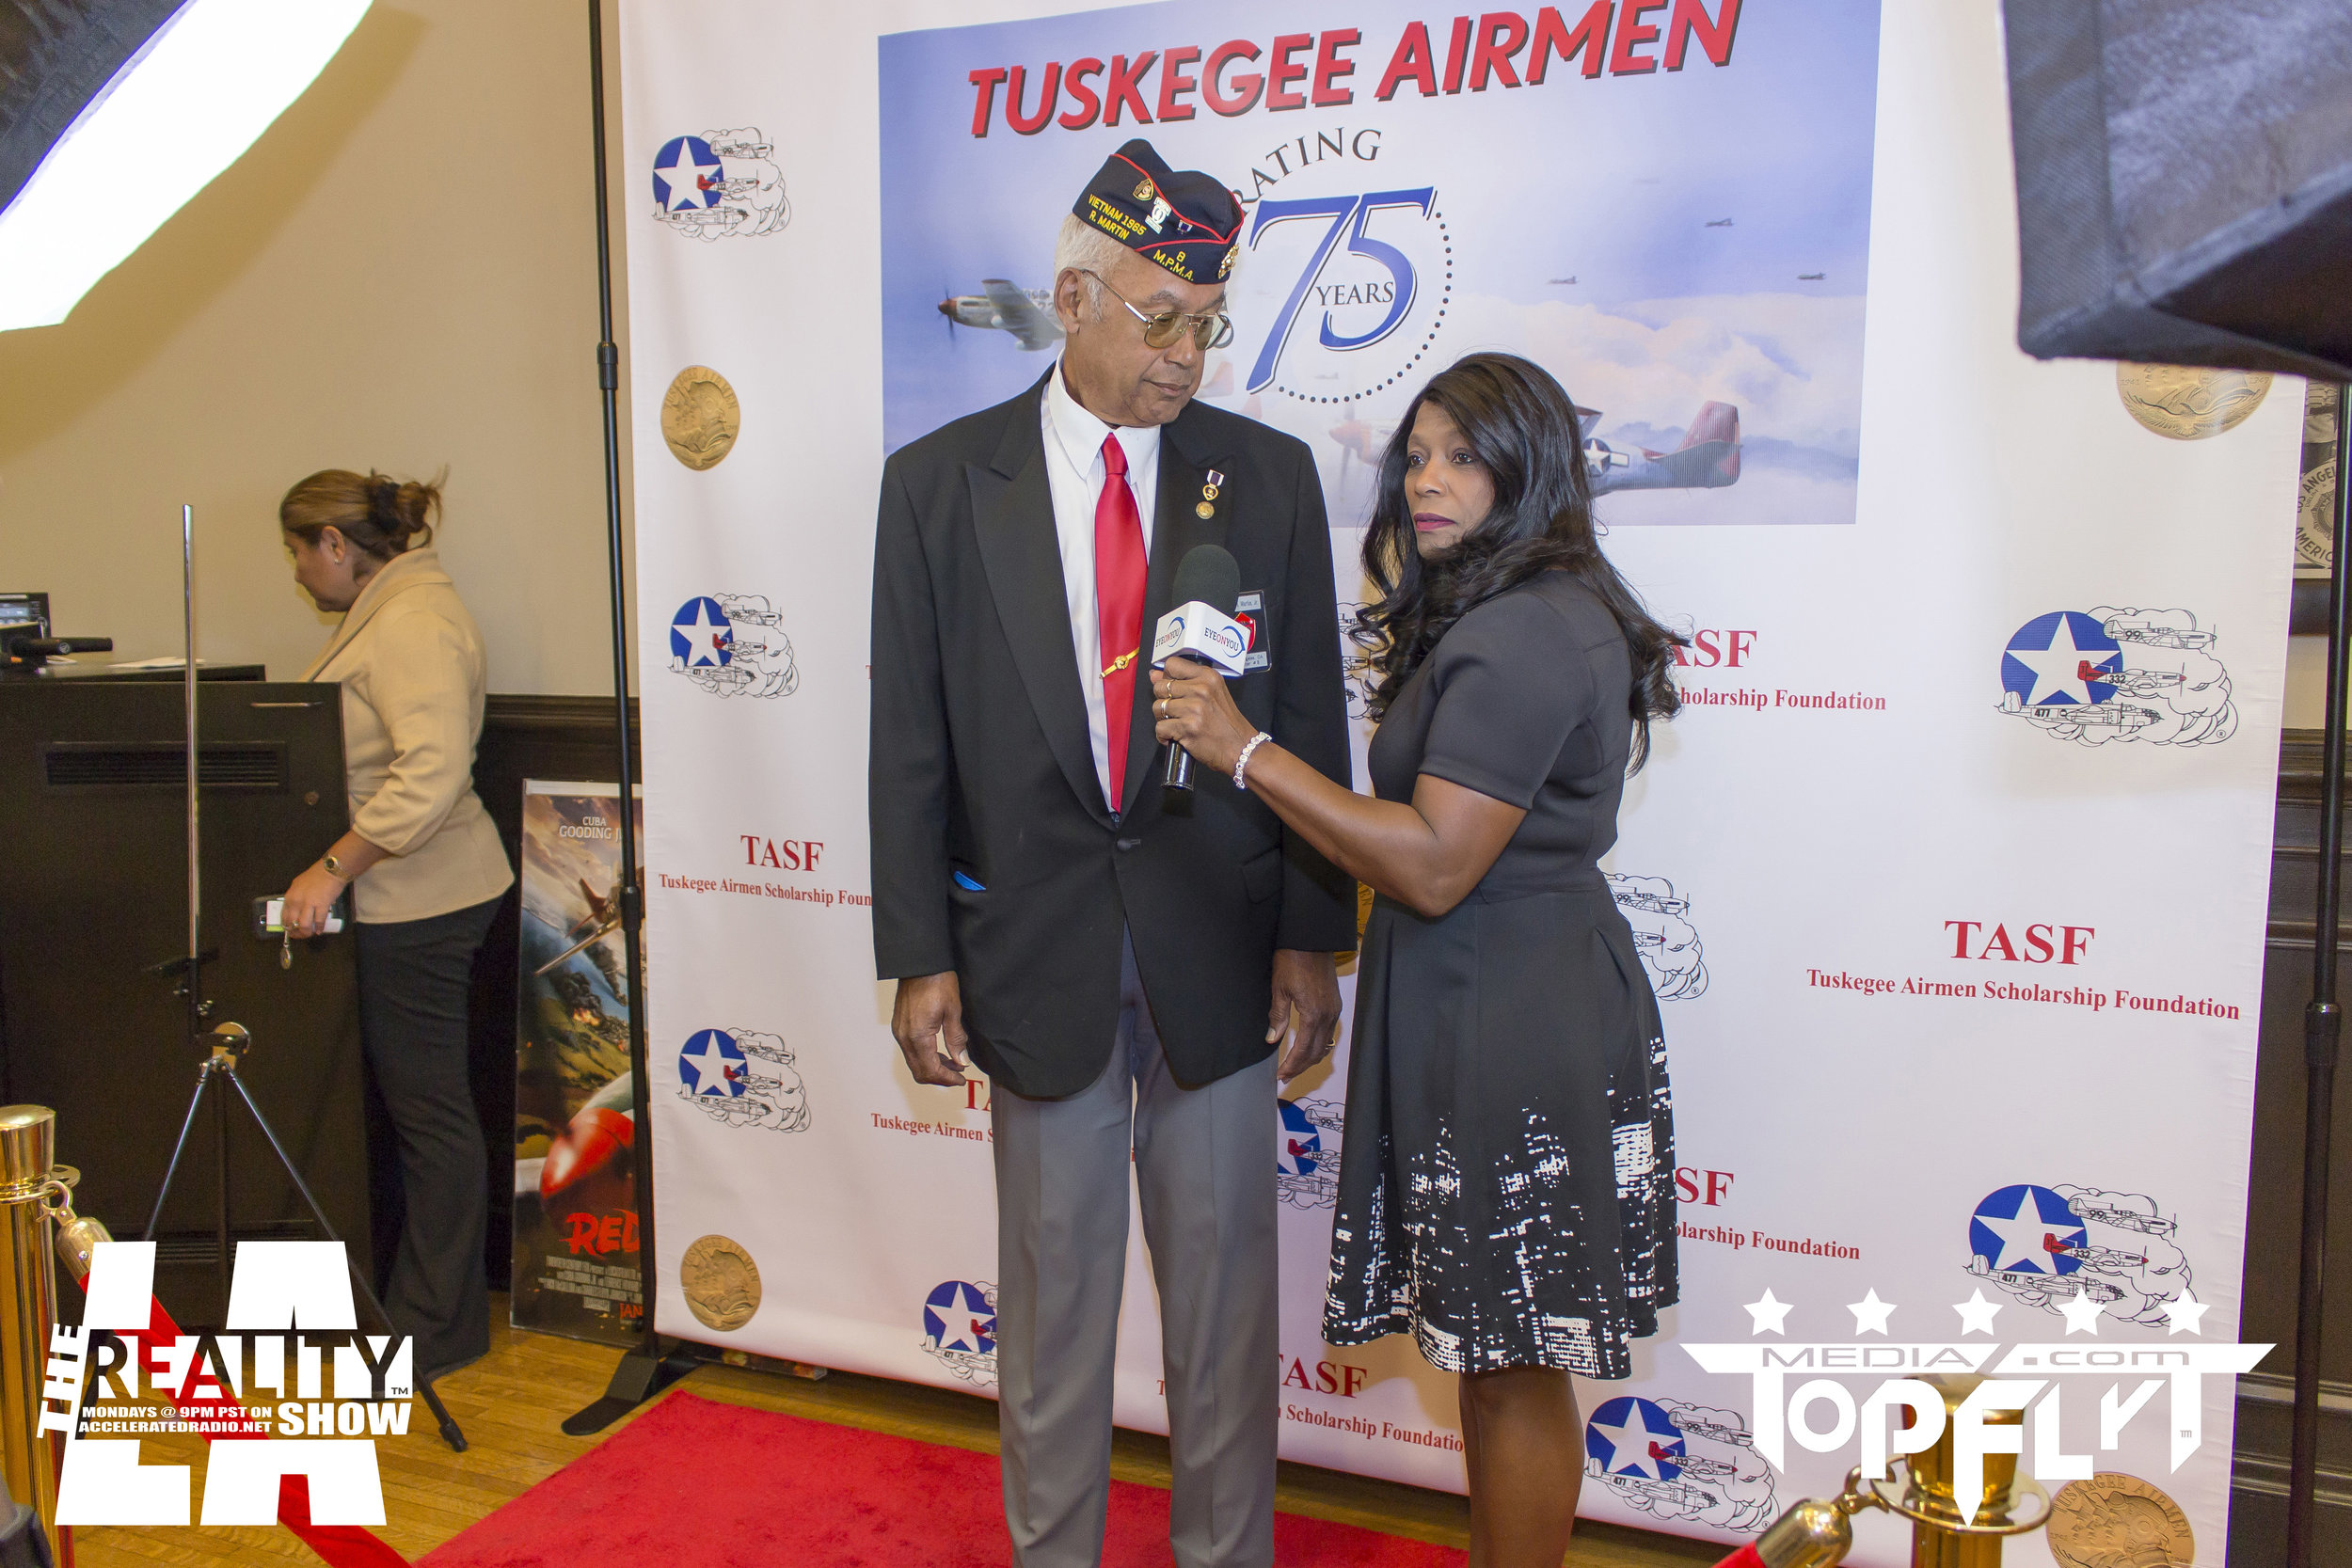 The Reality Show LA - Tuskegee Airmen 75th Anniversary VIP Reception_60.jpg